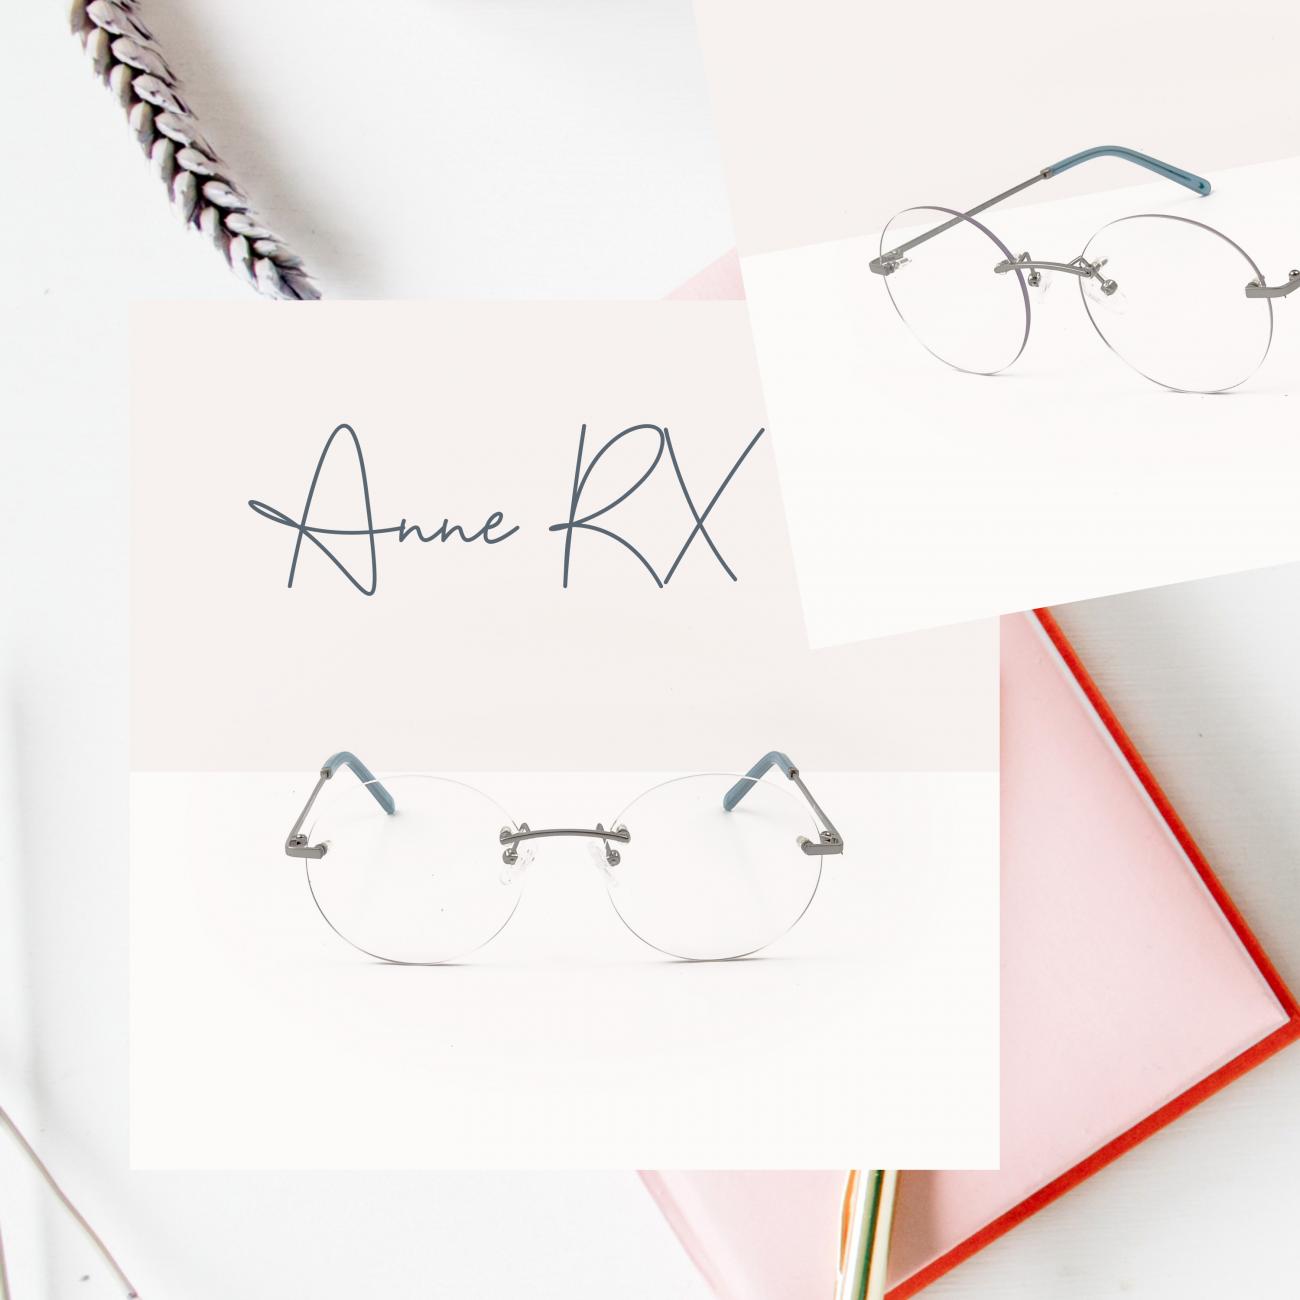 Anne RX1